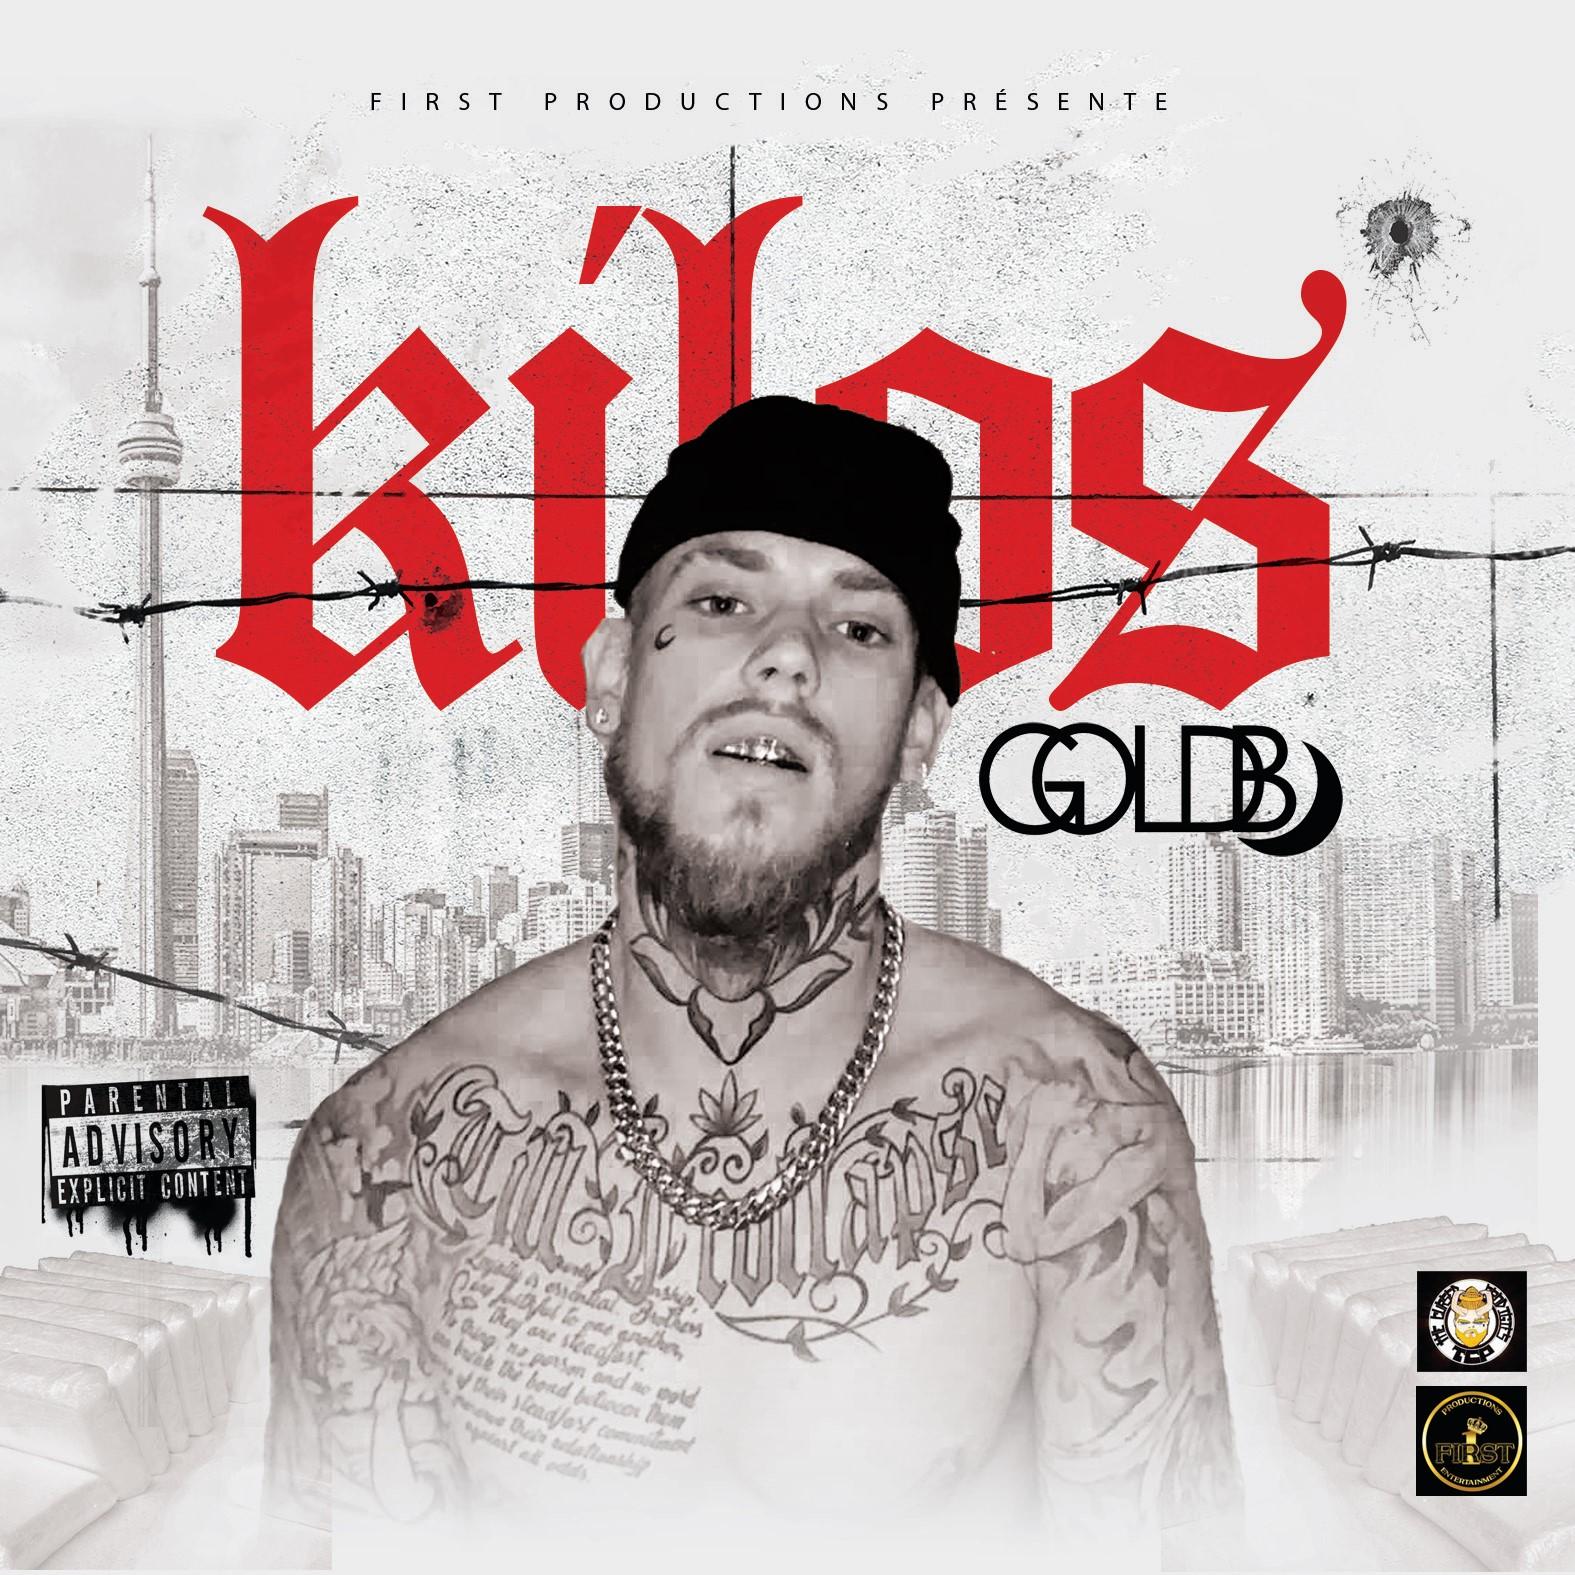 Gold B - Kilos